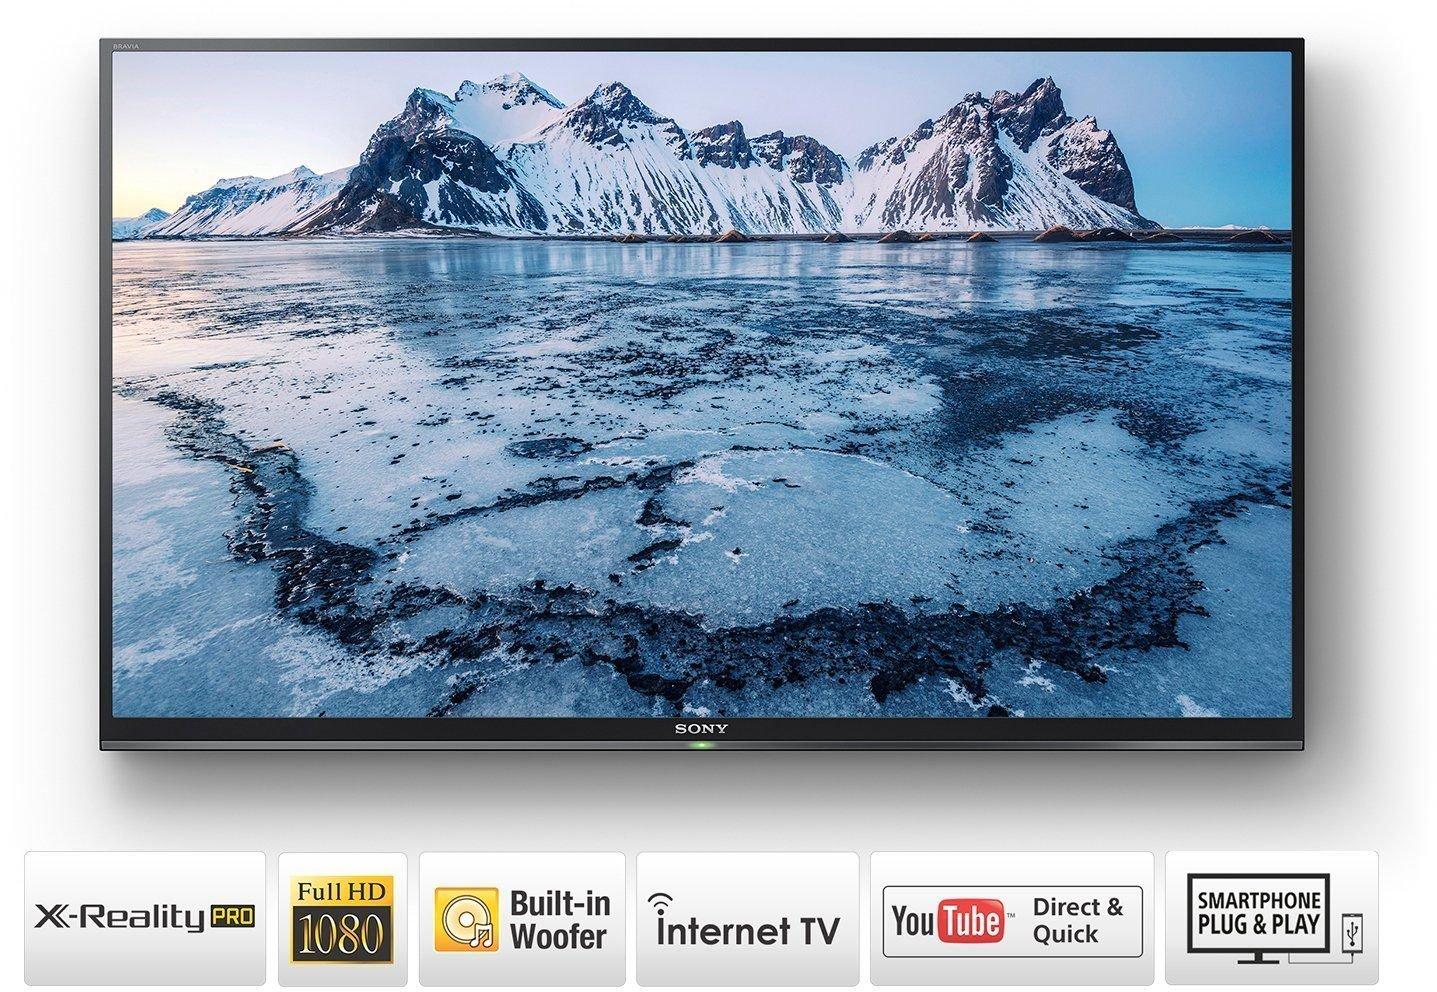 Top 10 40 inch LED TVs in India - Sony KLV-40W672E Full HD LED Smart TV